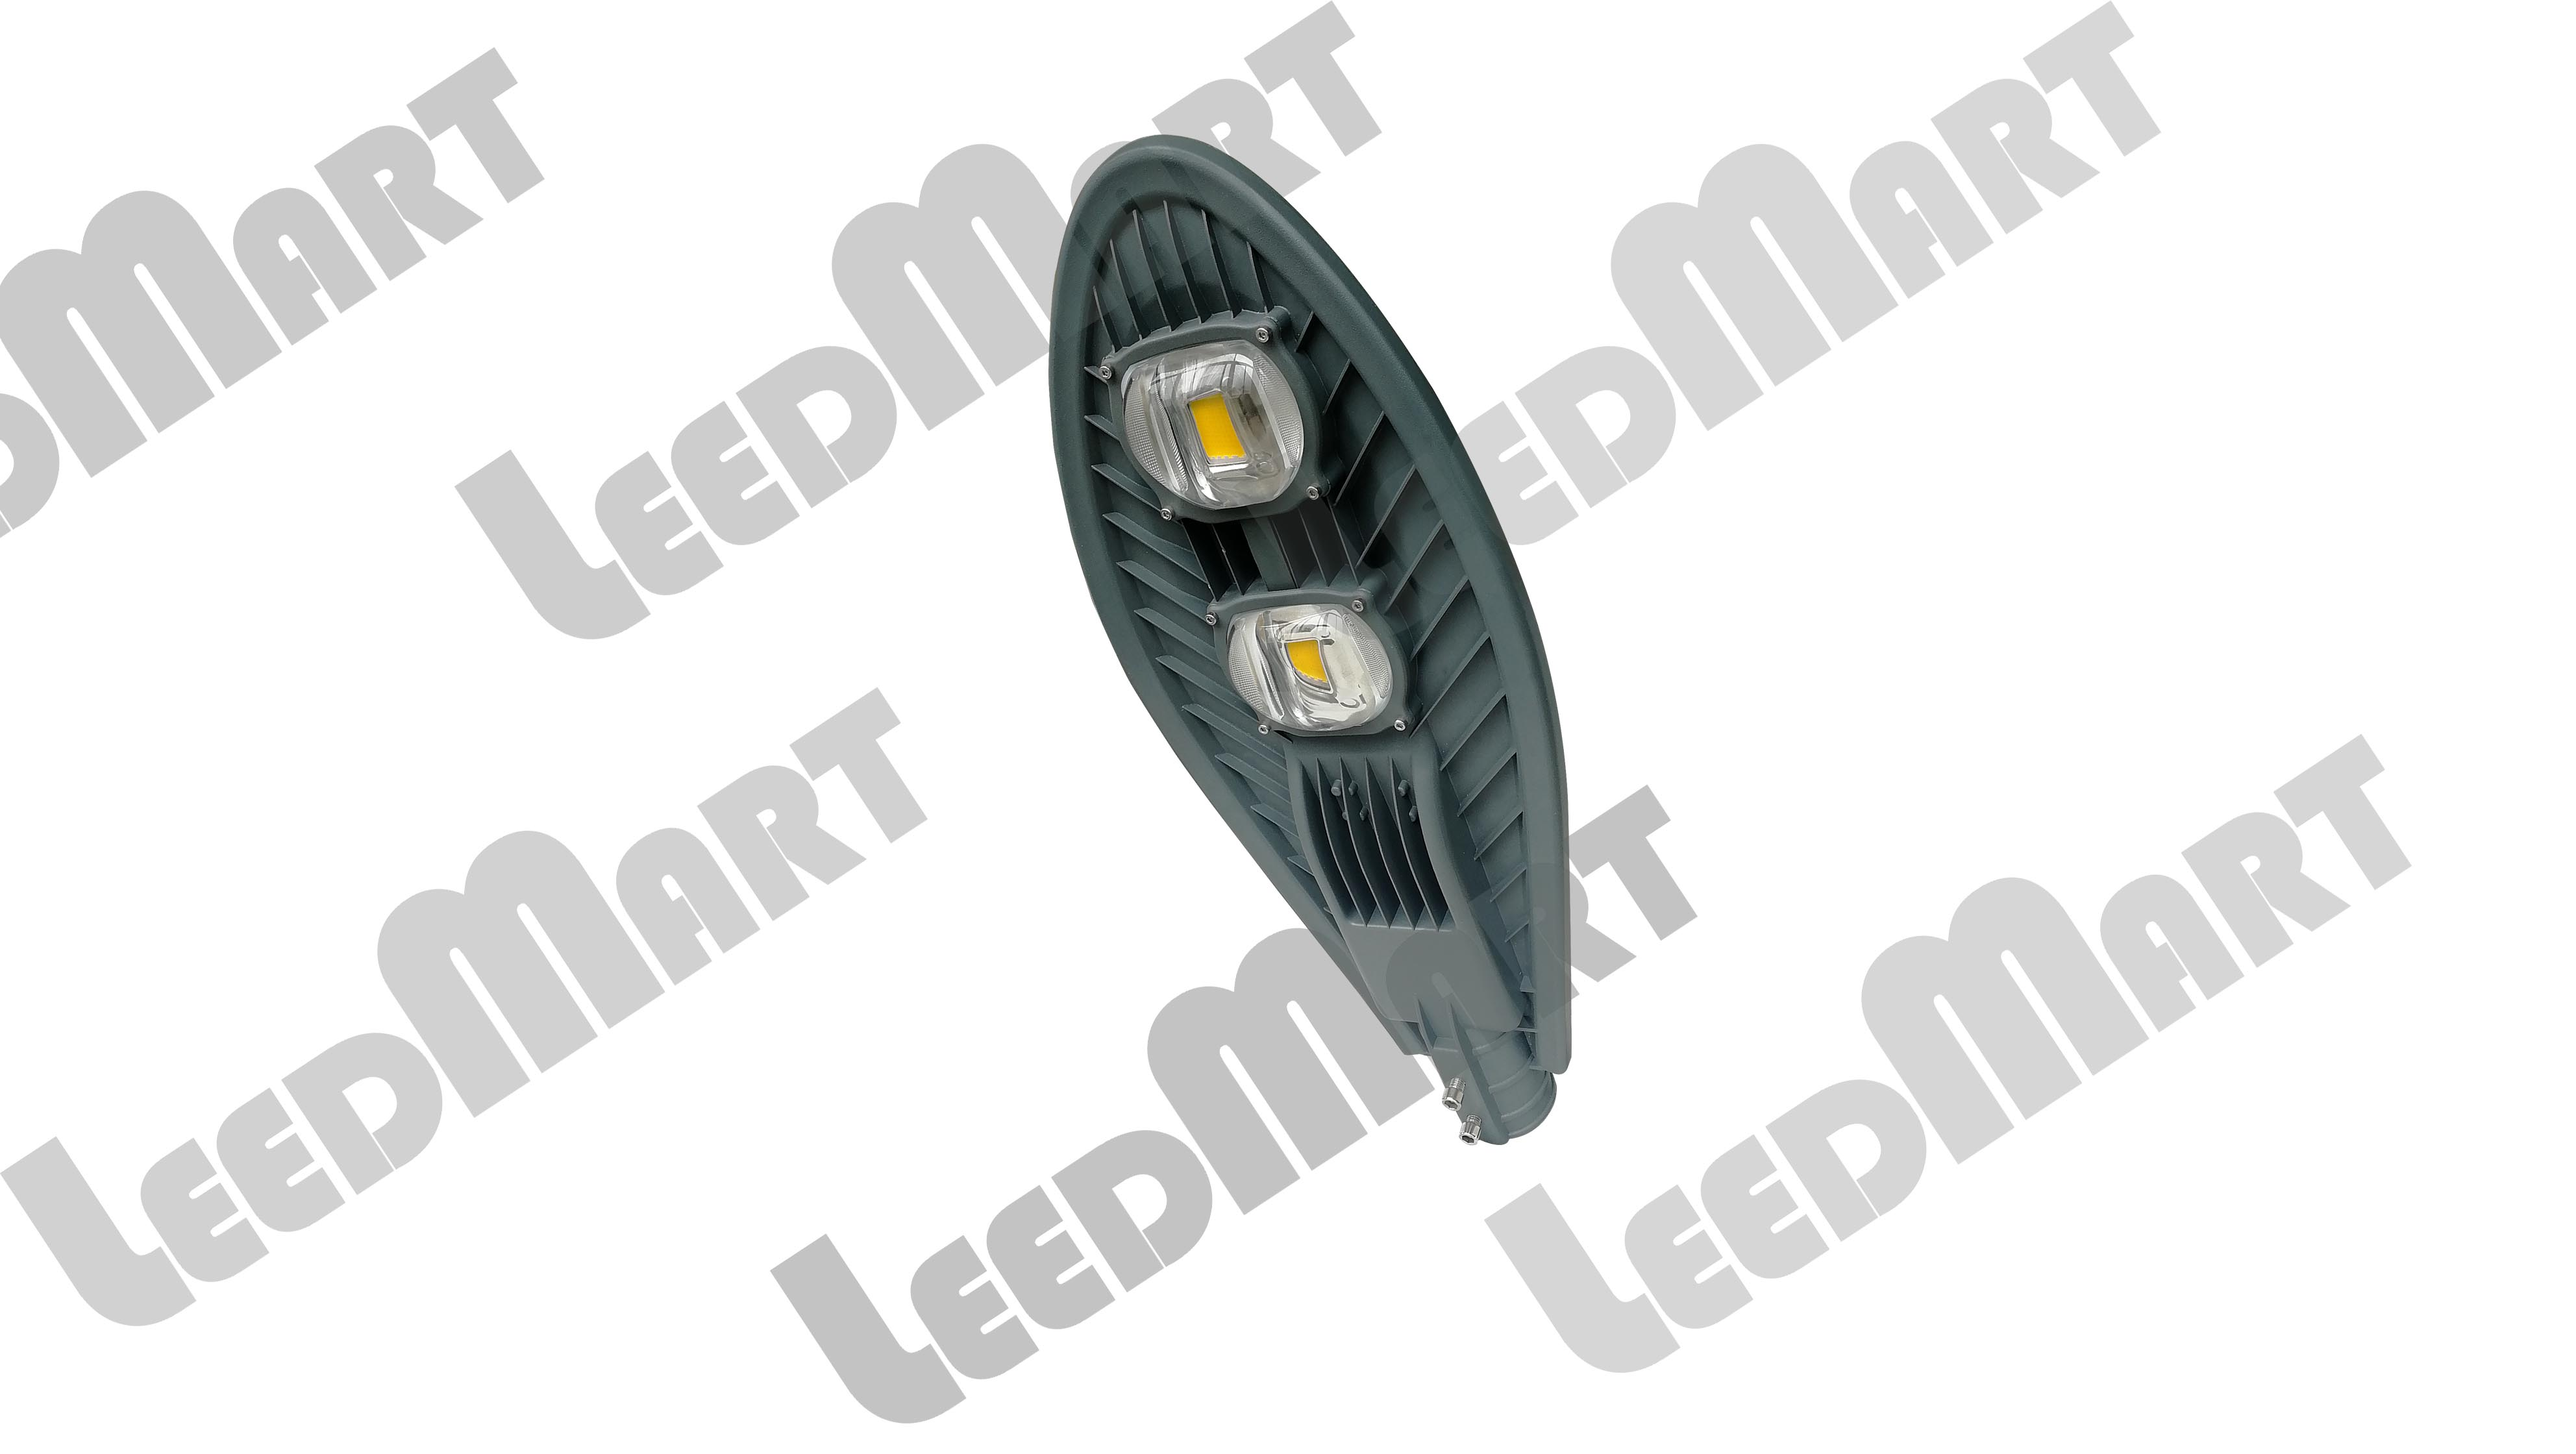 Best price cost effective IP65 50 watt -200 watt 24000 lumen LED Street Light